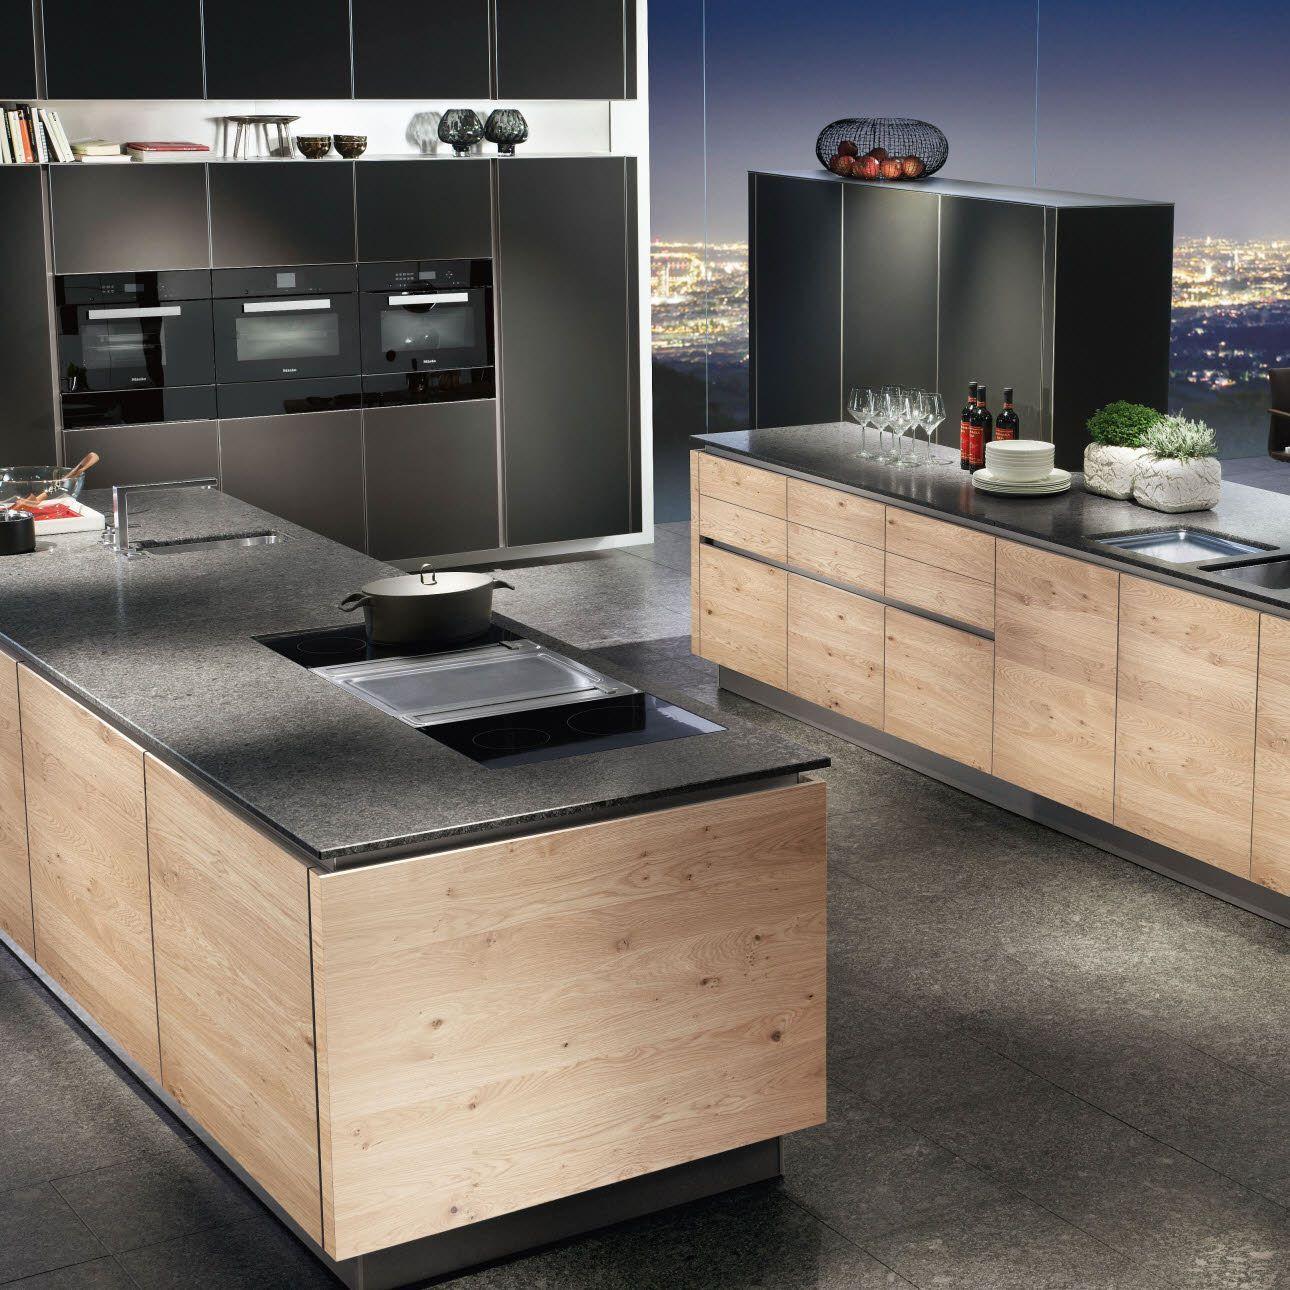 intuo bido glasfronten kombiniert mit holzfront wild oak pallet pinterest k che haus. Black Bedroom Furniture Sets. Home Design Ideas